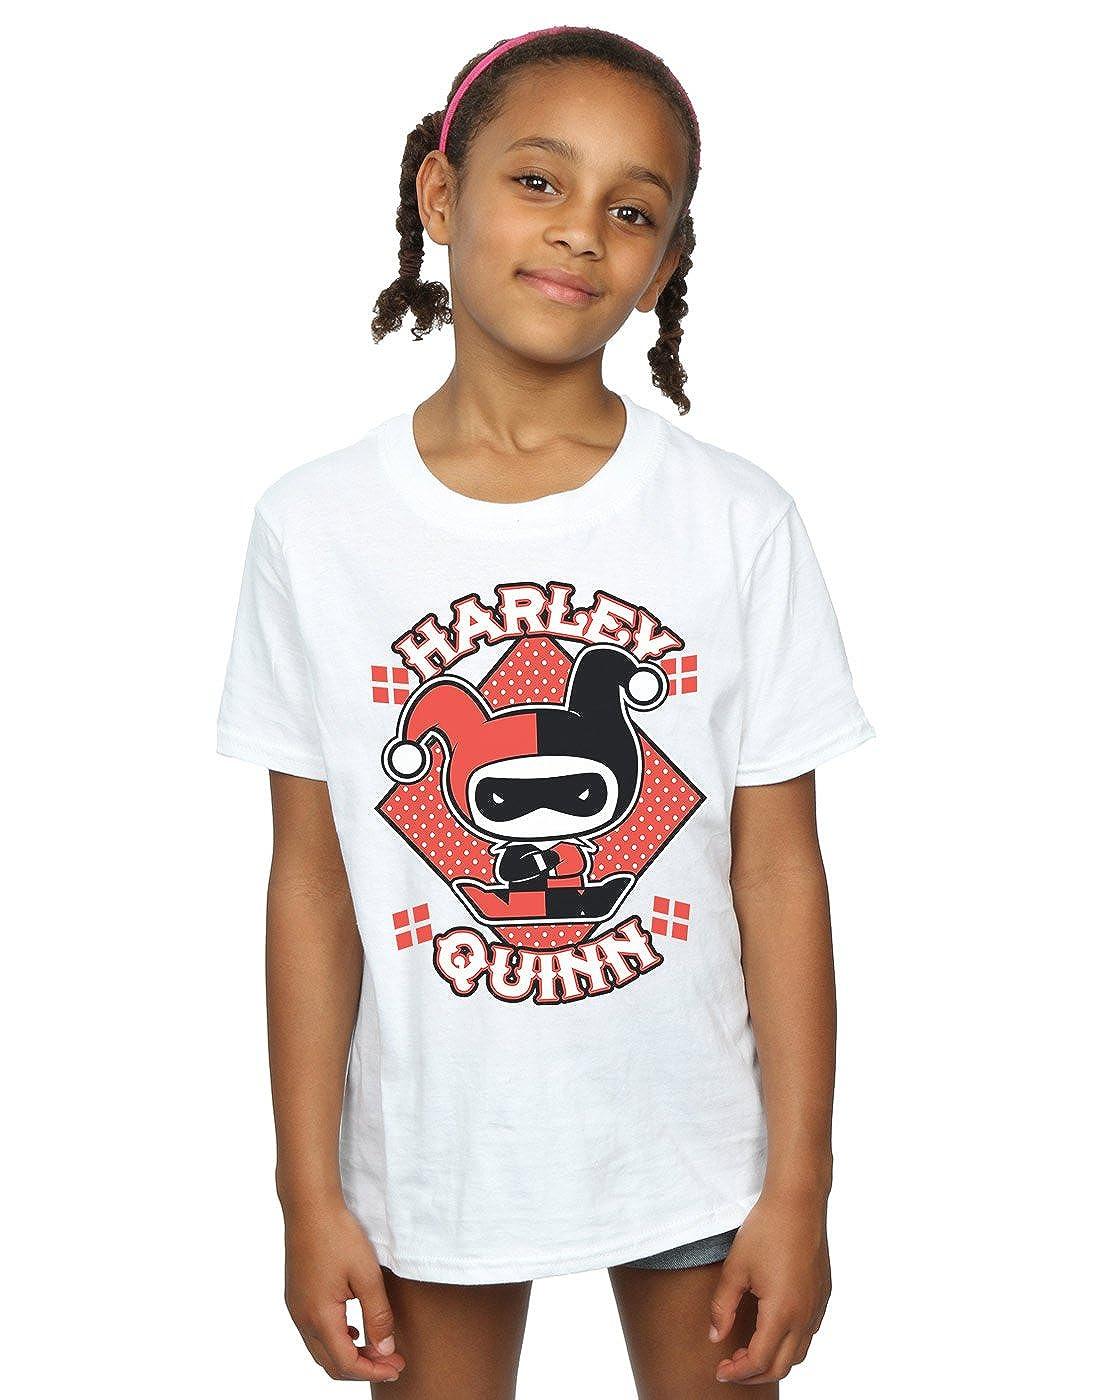 DC Comics Girls Chibi Harley Quinn Badge T-Shirt Absolute Cult